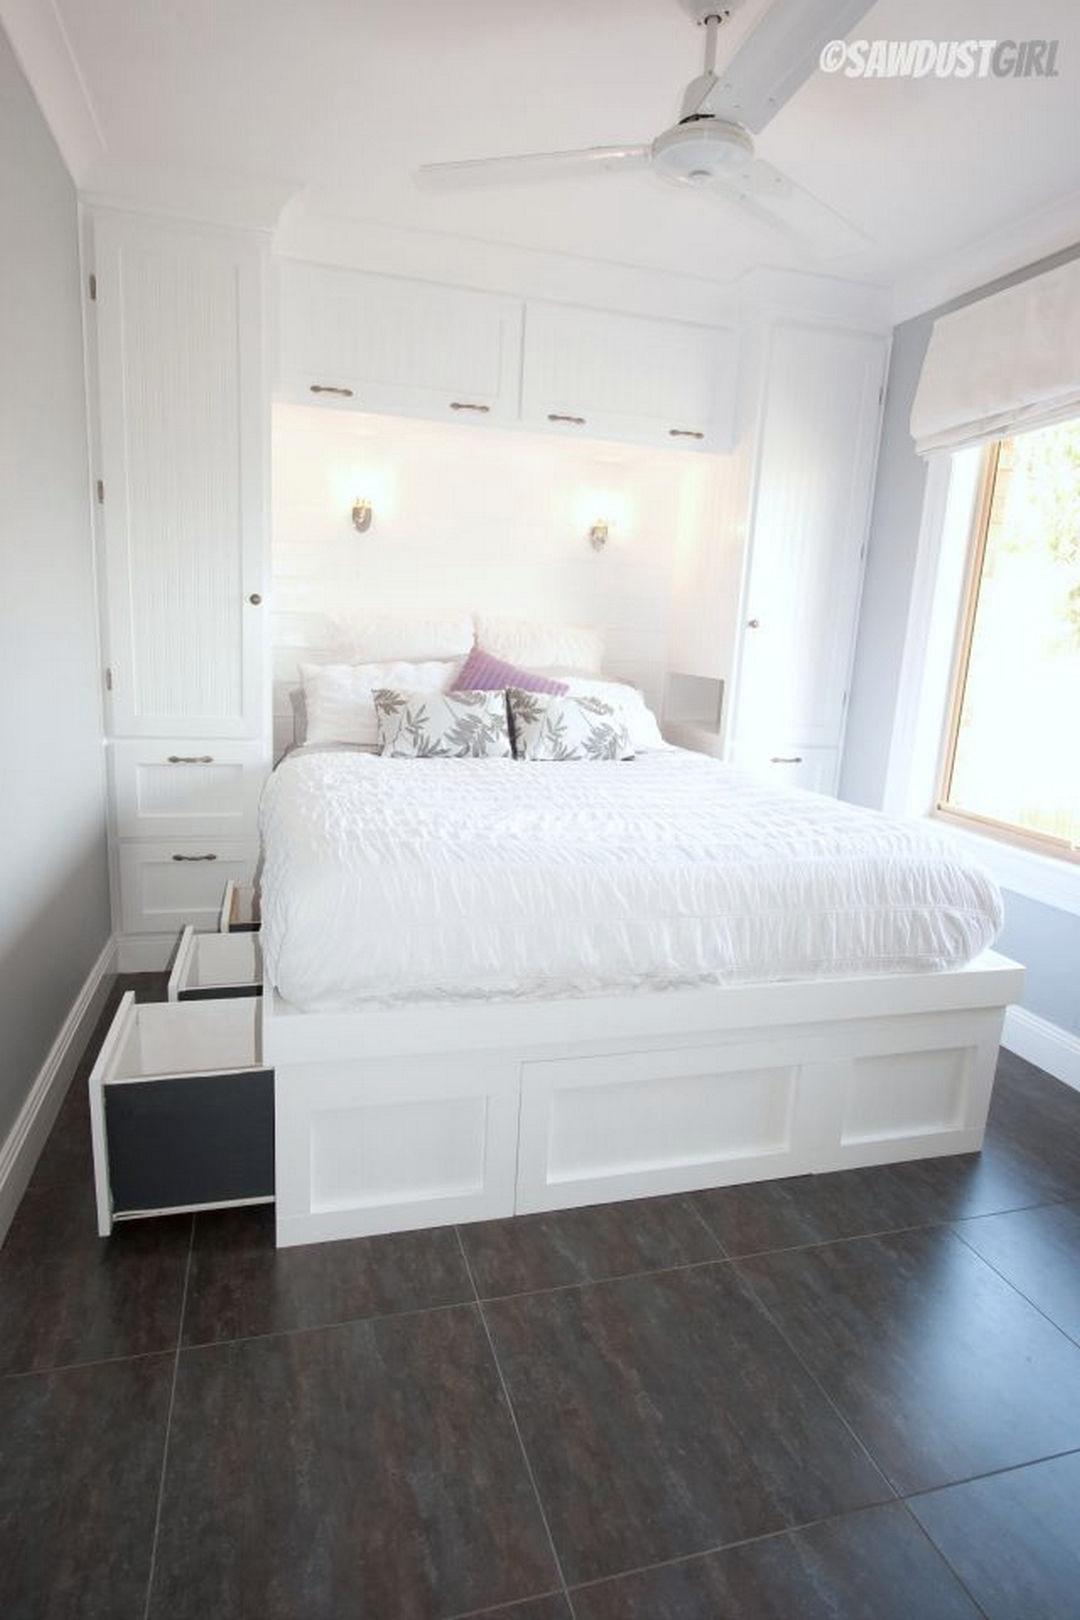 5 Stunning Bedroom Storage Ideas Bedroom Built Ins Small Master Bedroom Tiny Bedroom